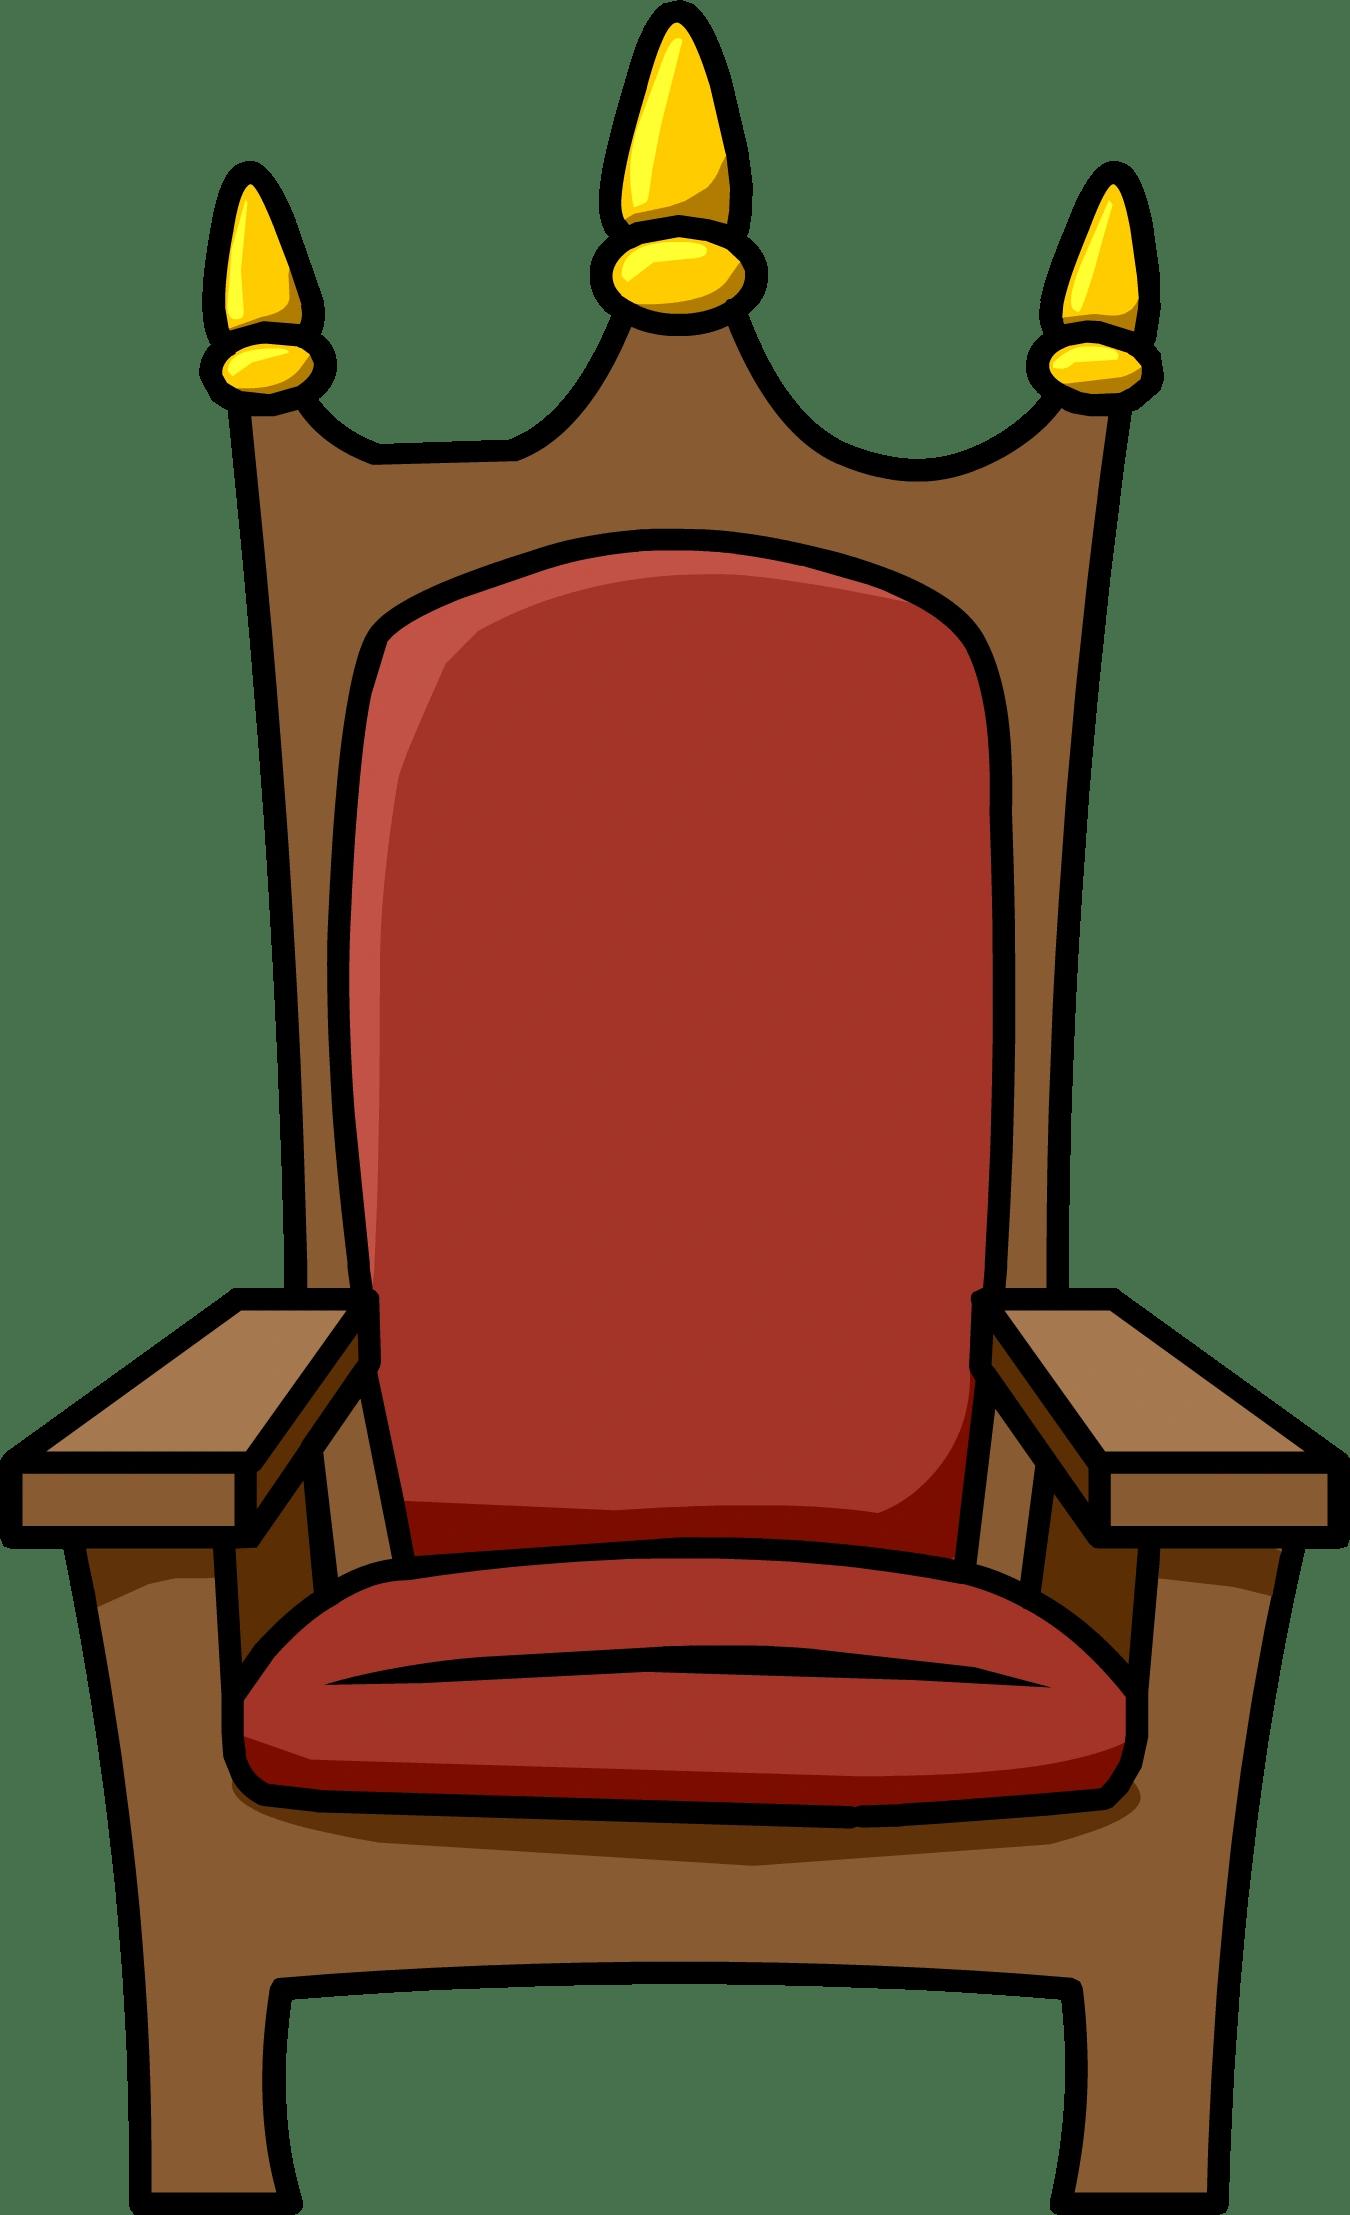 the chair king rectangular leg caps royal throne id 343 club penguin wiki fandom powered